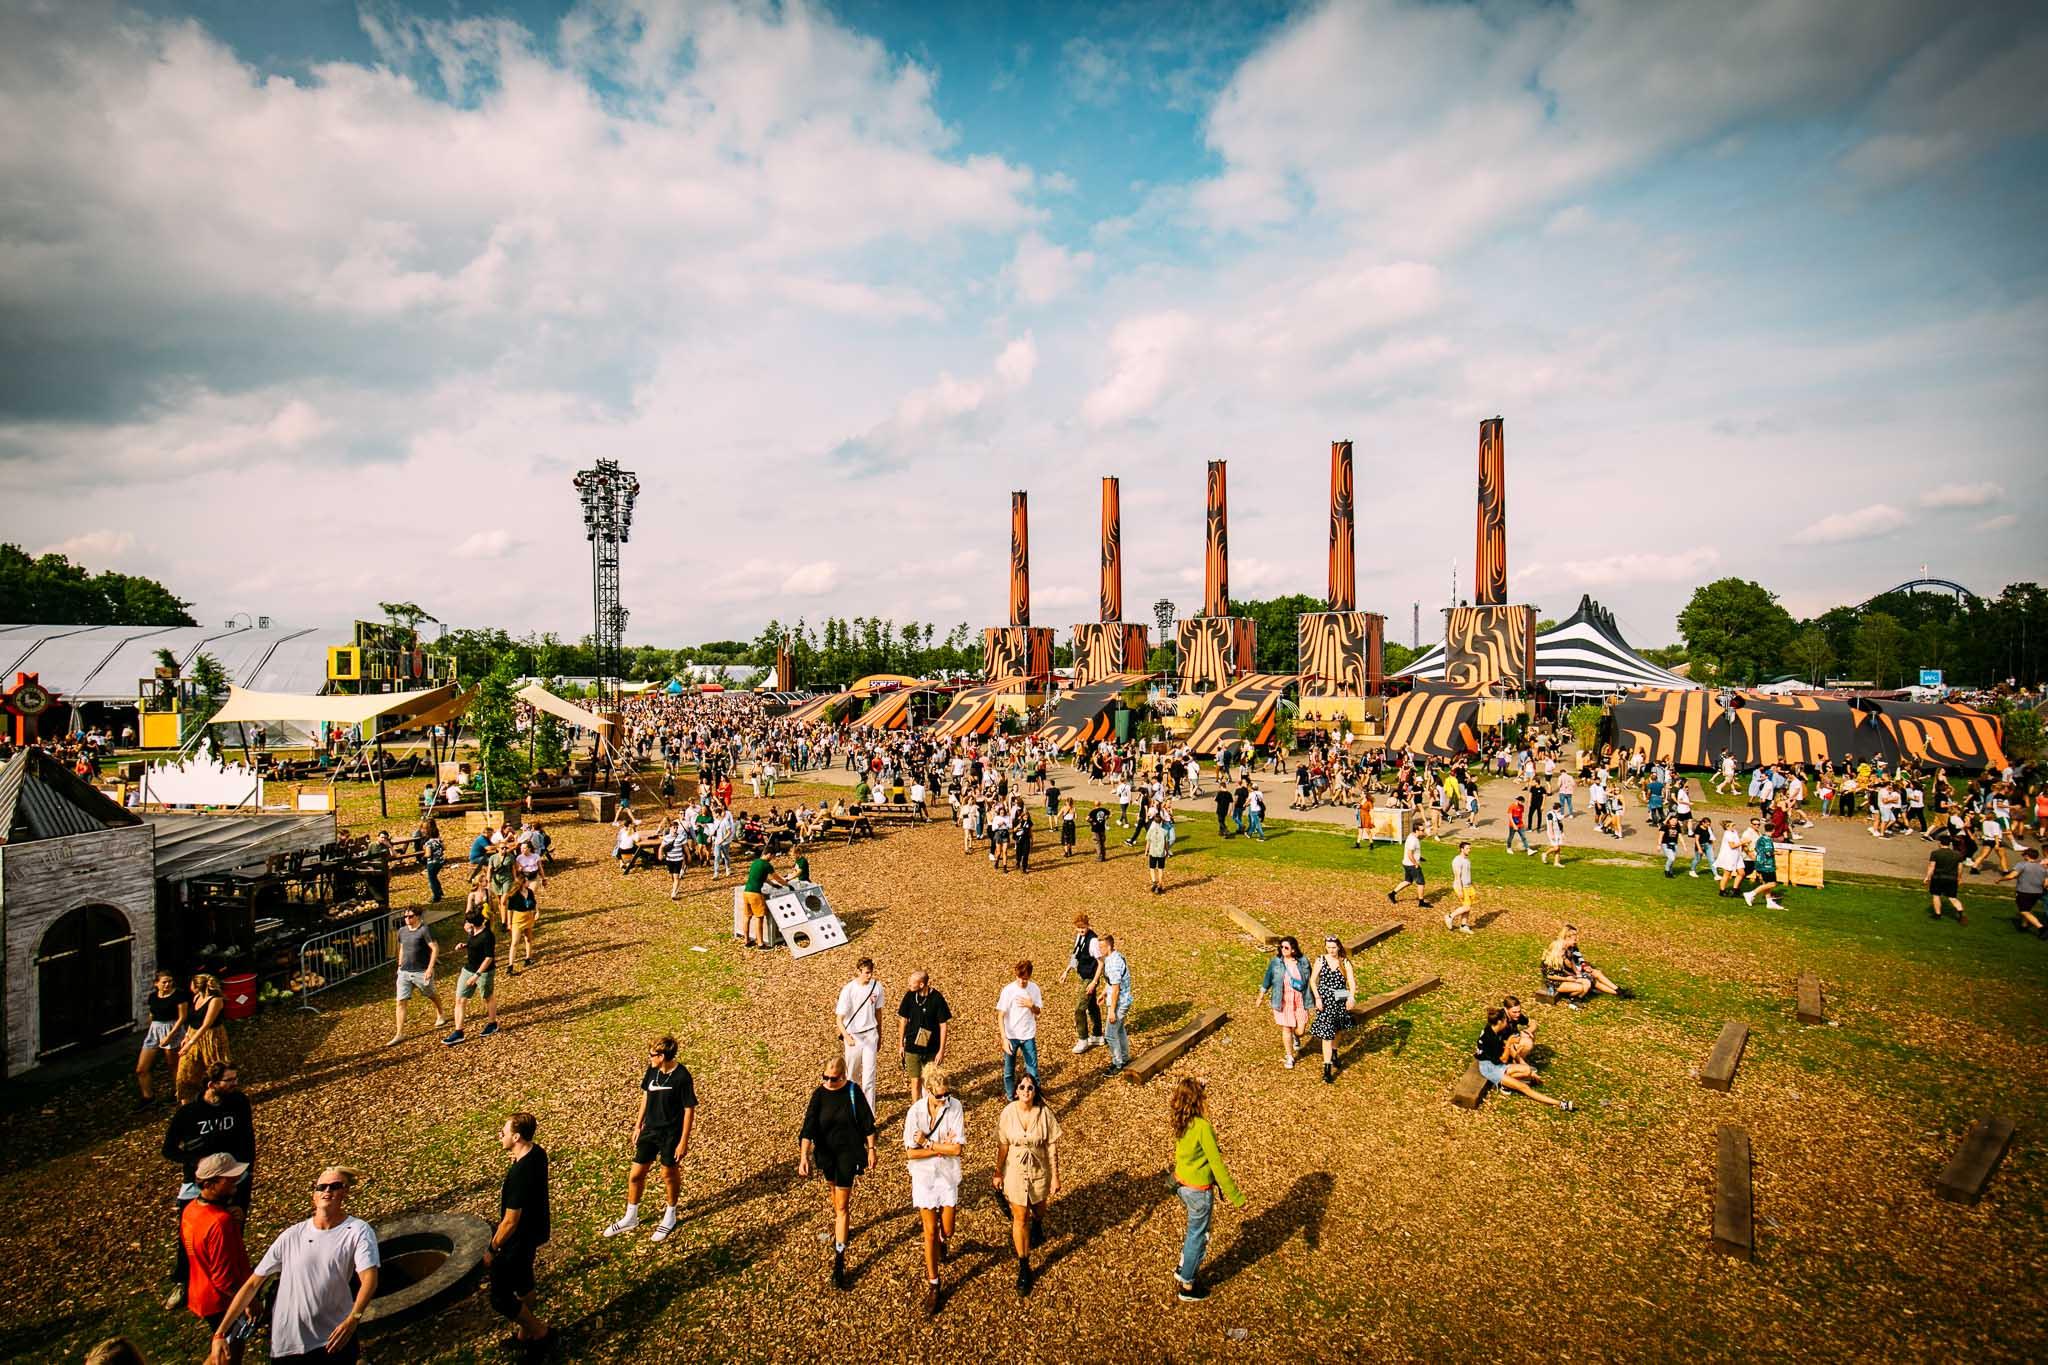 lowlands-festival-nathanreinds